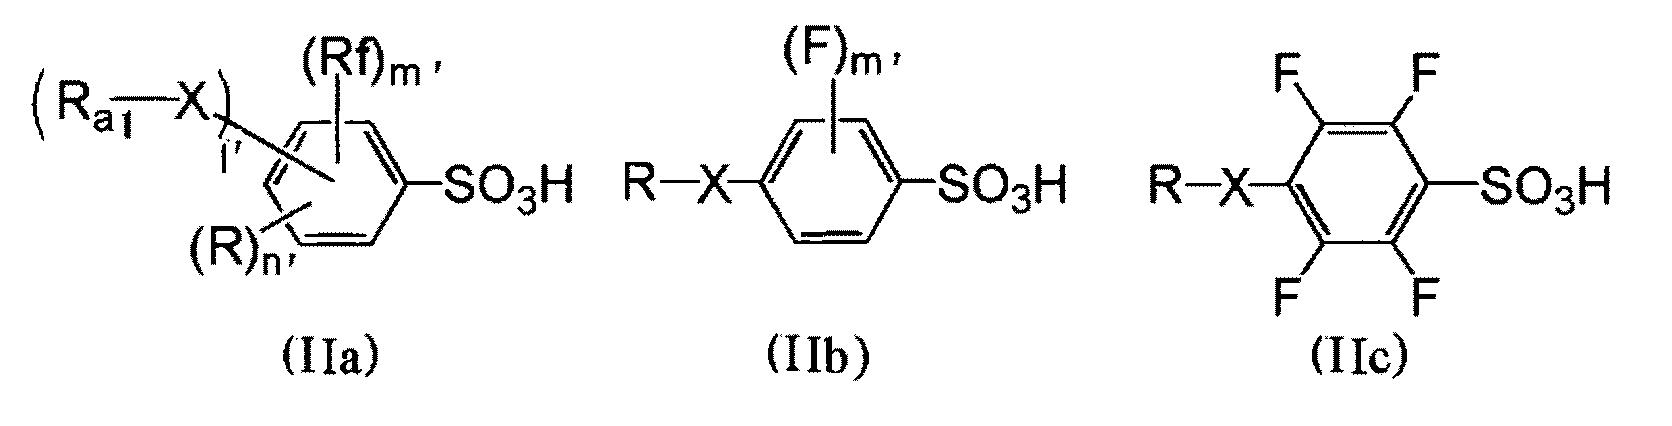 Figure 112011039817284-pct00063